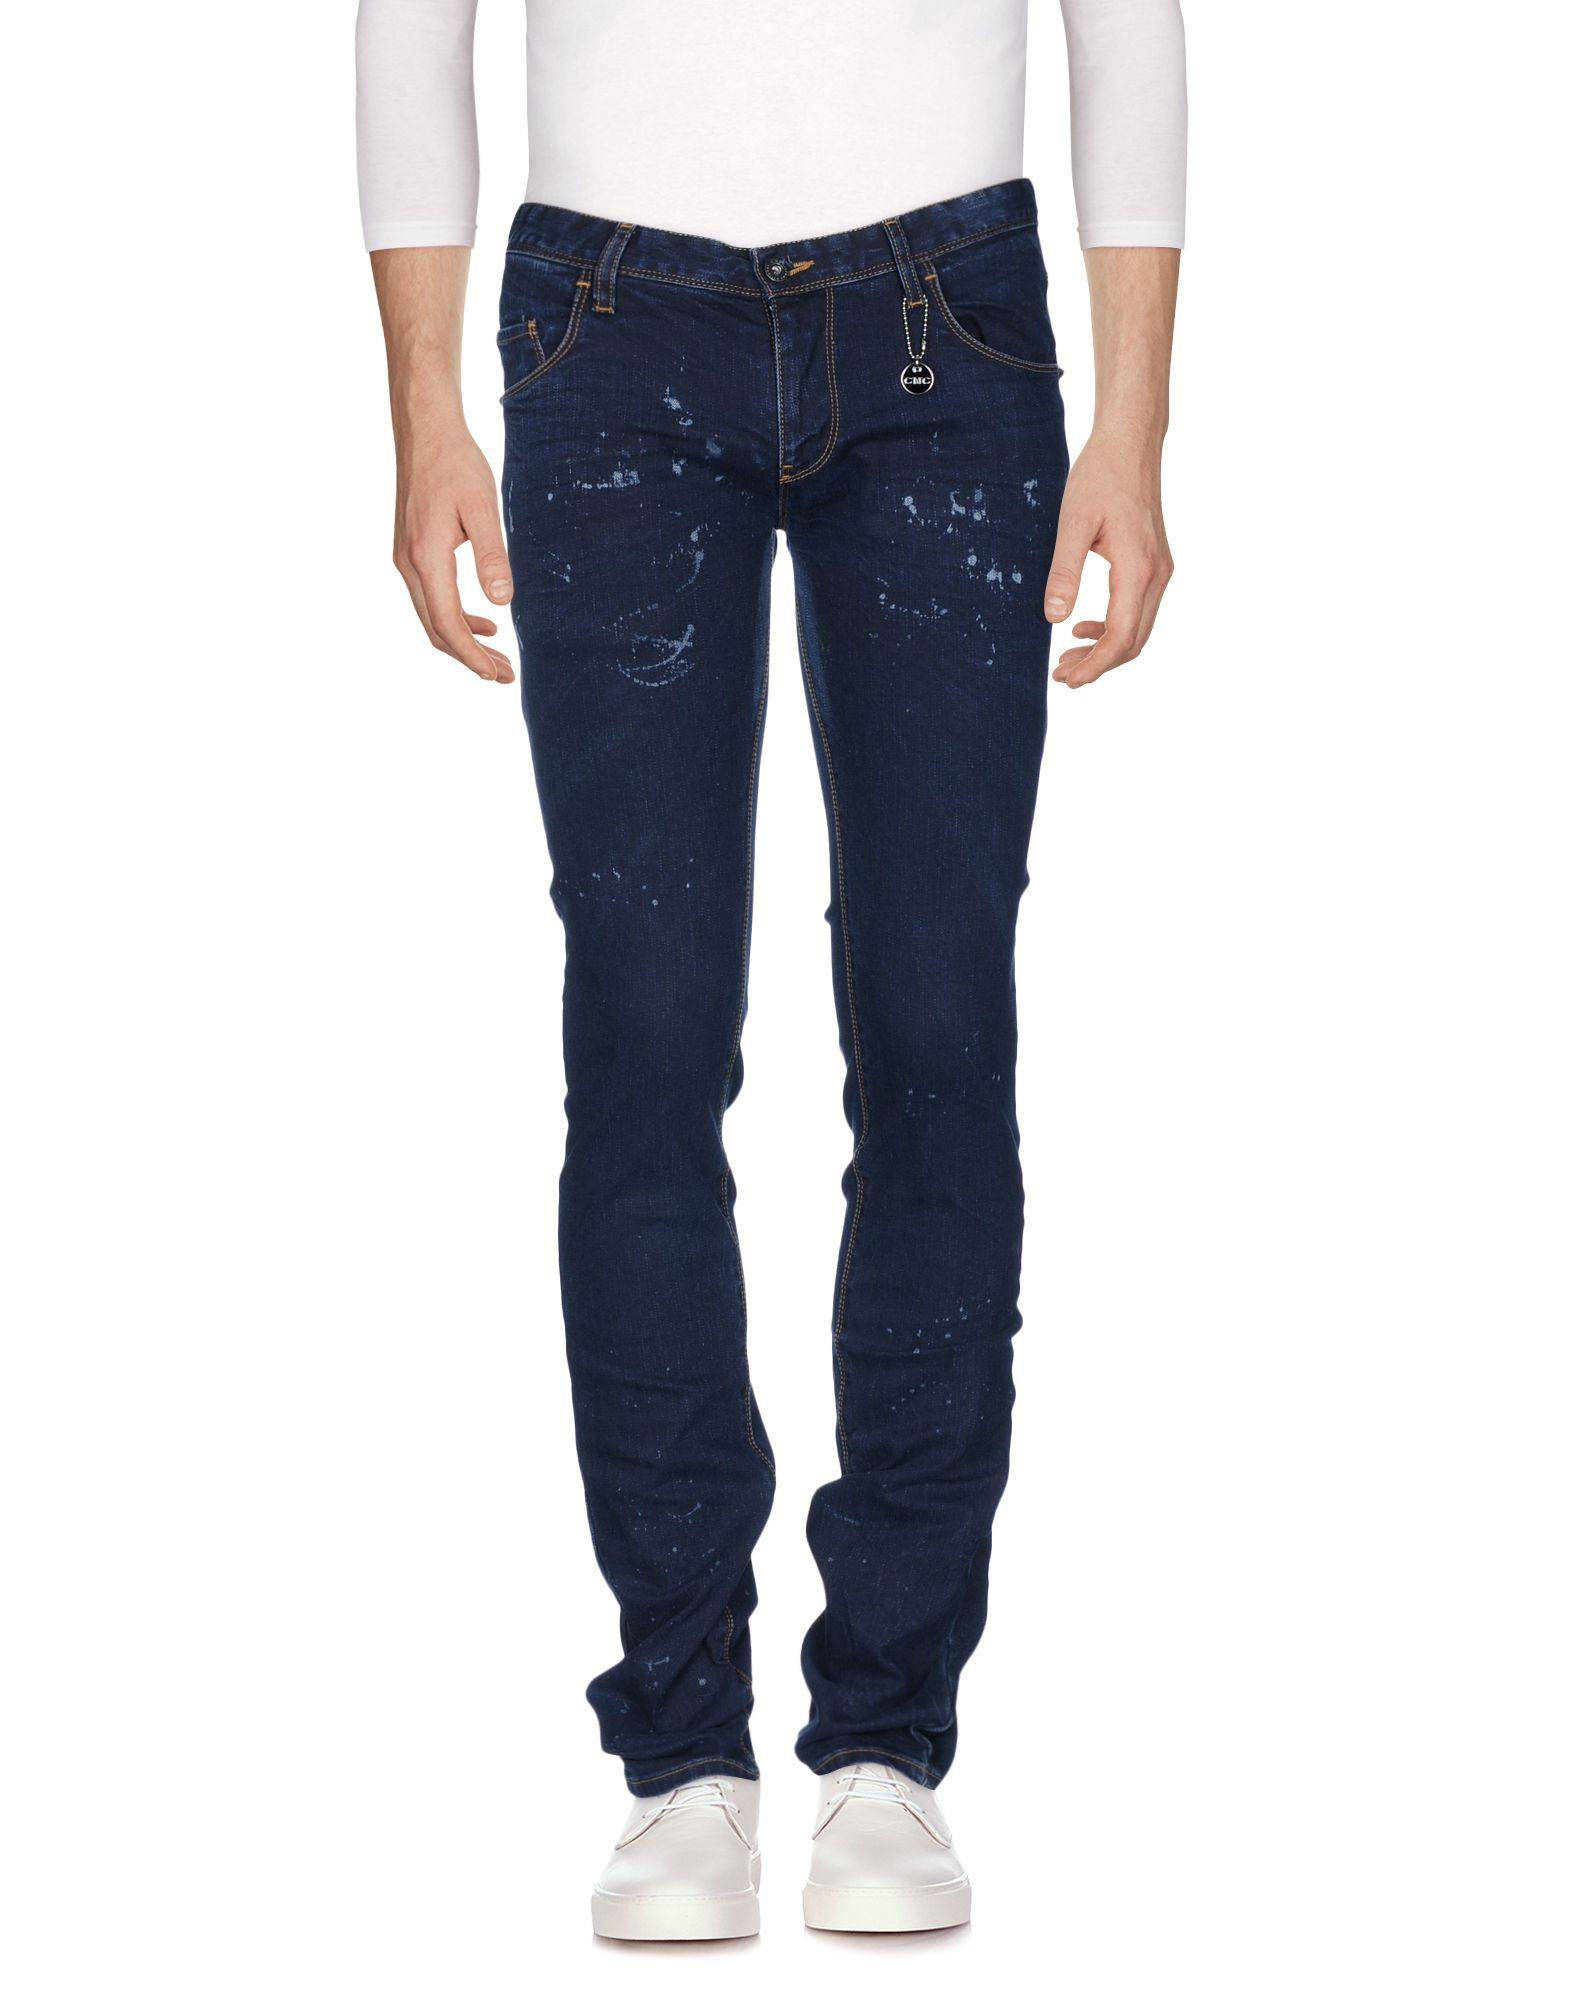 Pantaloni Jeans Cnc Costume National Uomo - Acquista online su